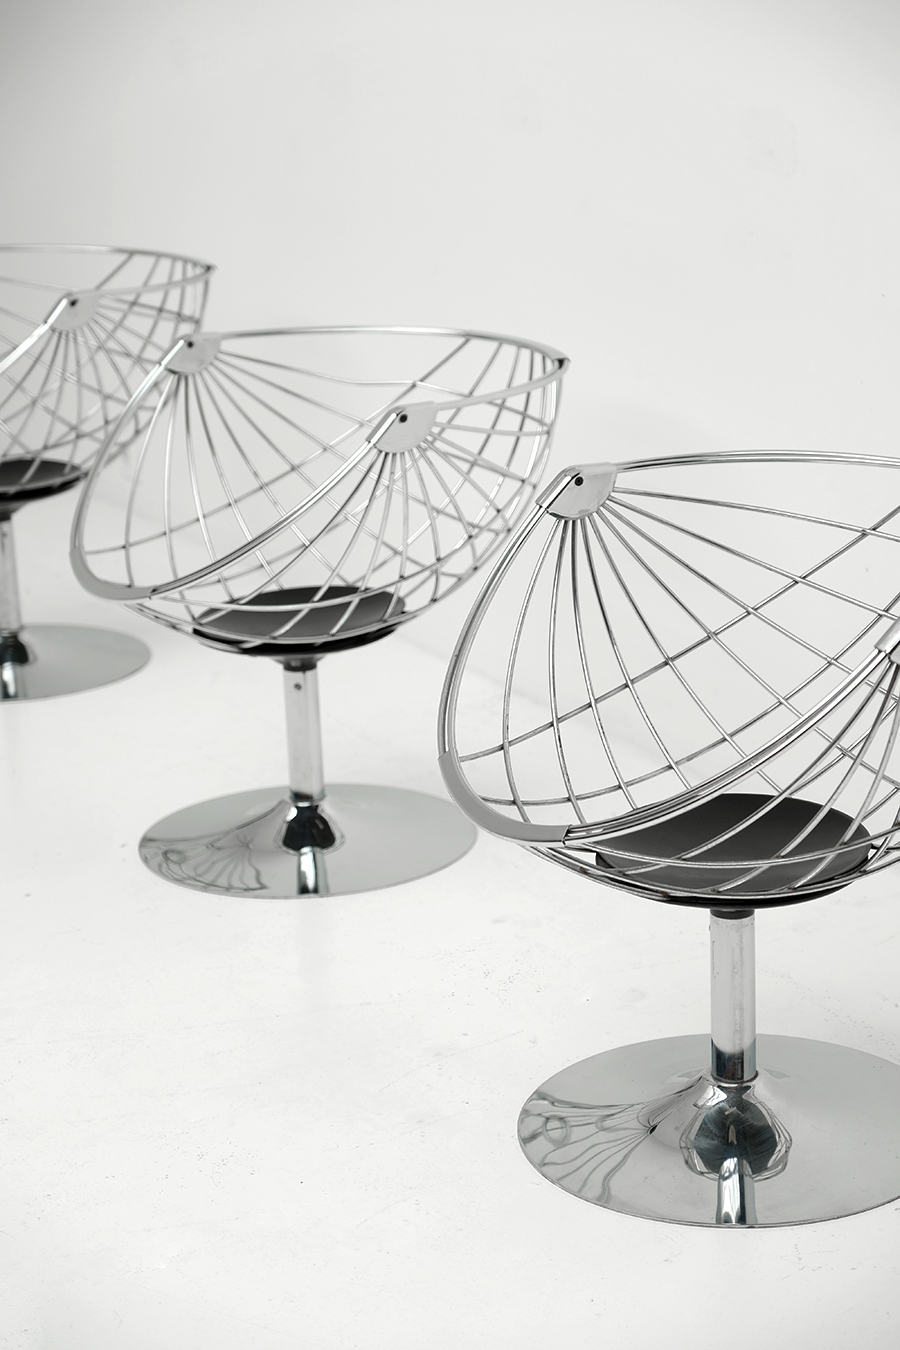 Rudy Verelst Novalux chairs image 7